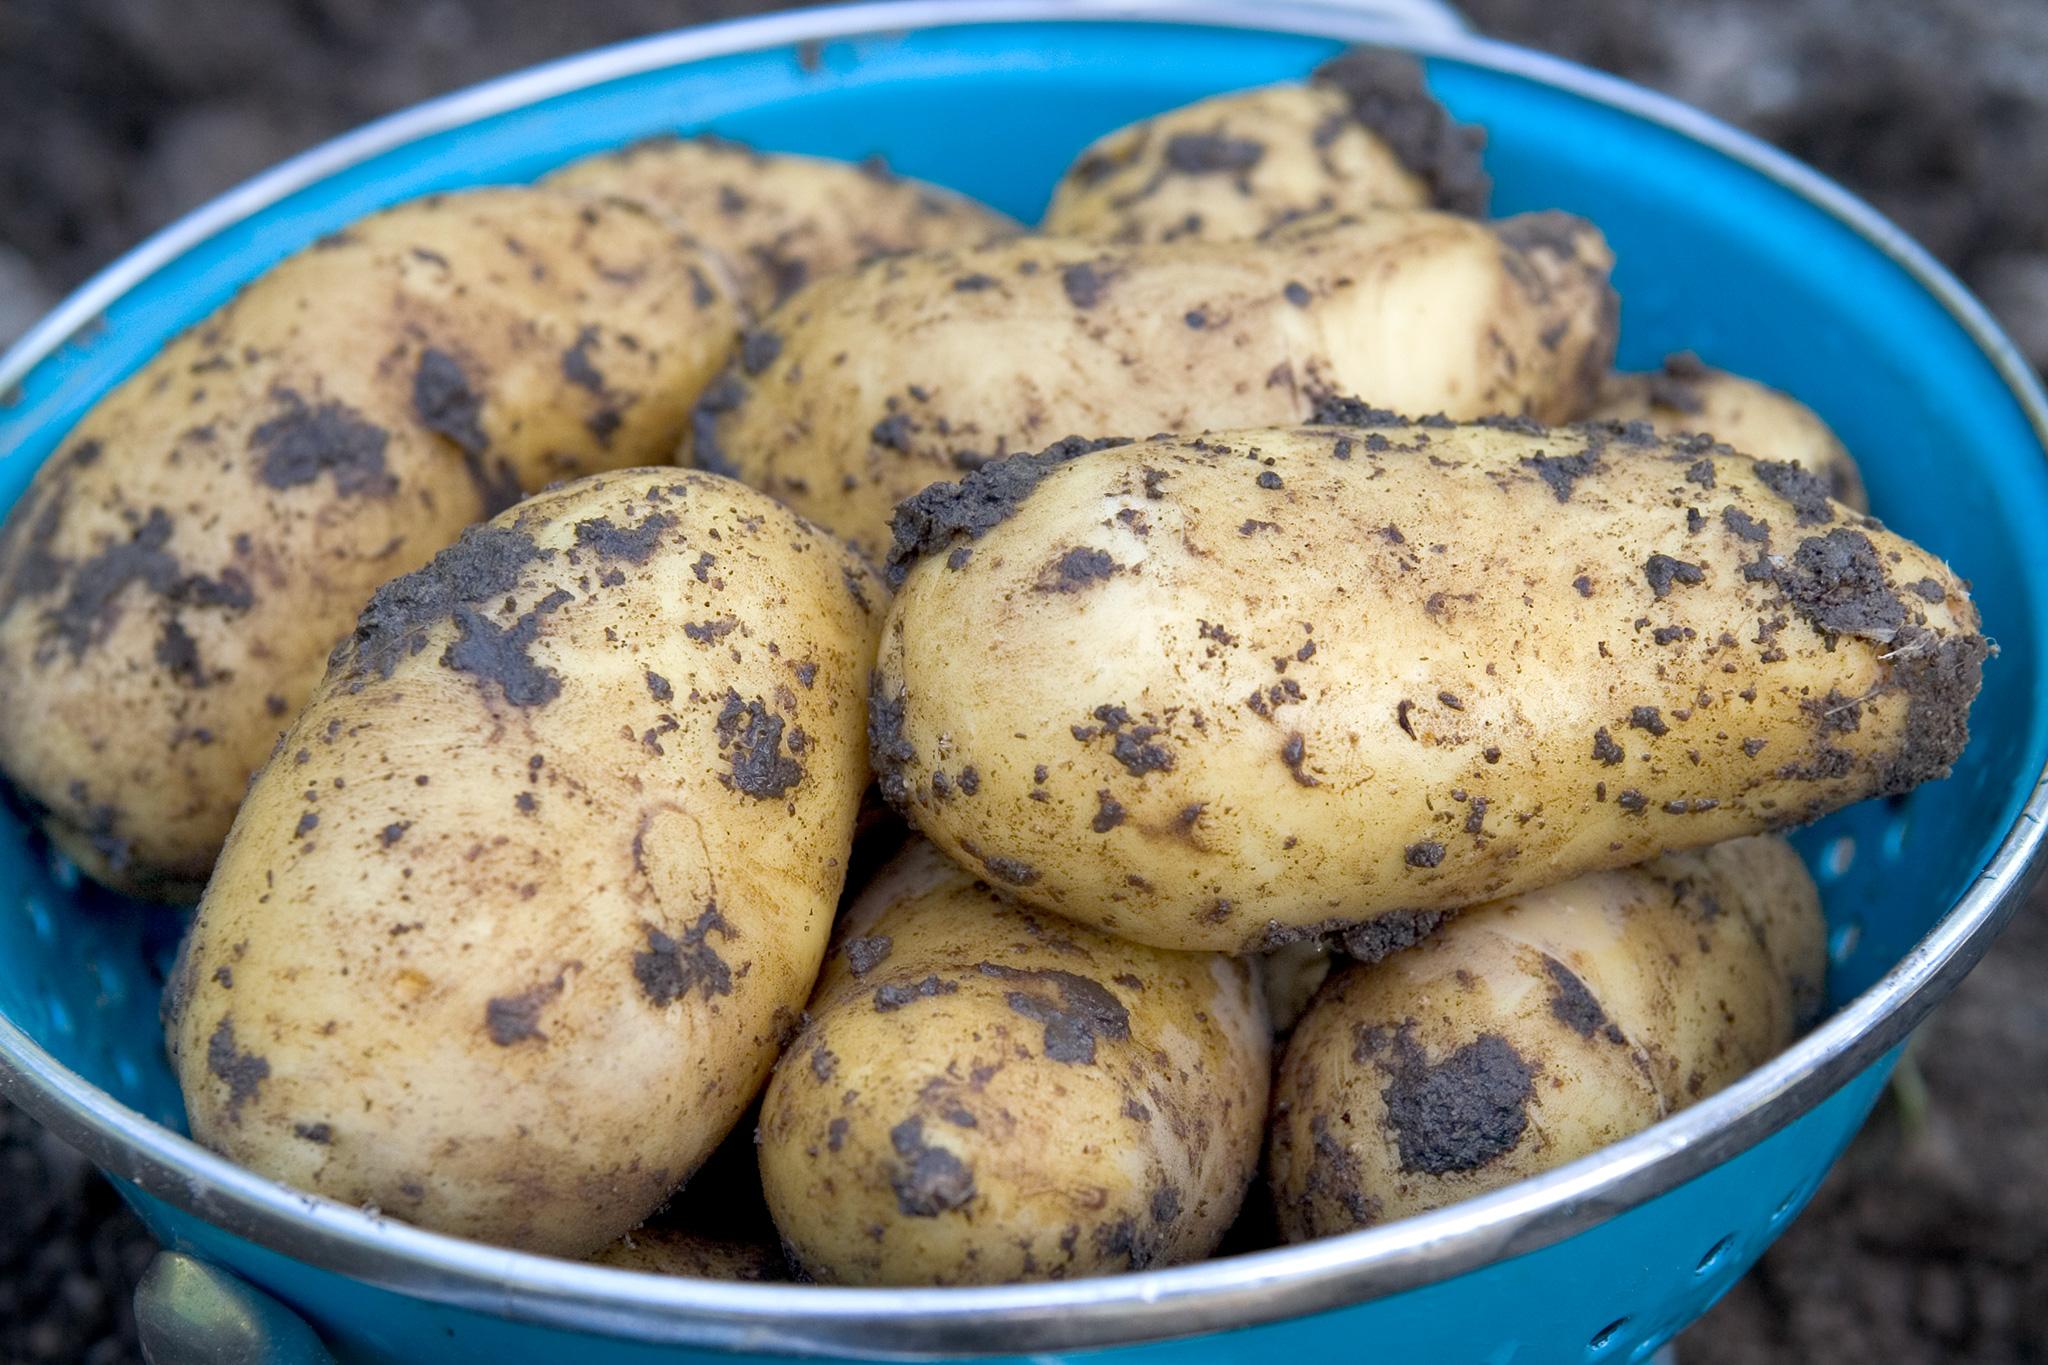 Harvested maincrop potatoes